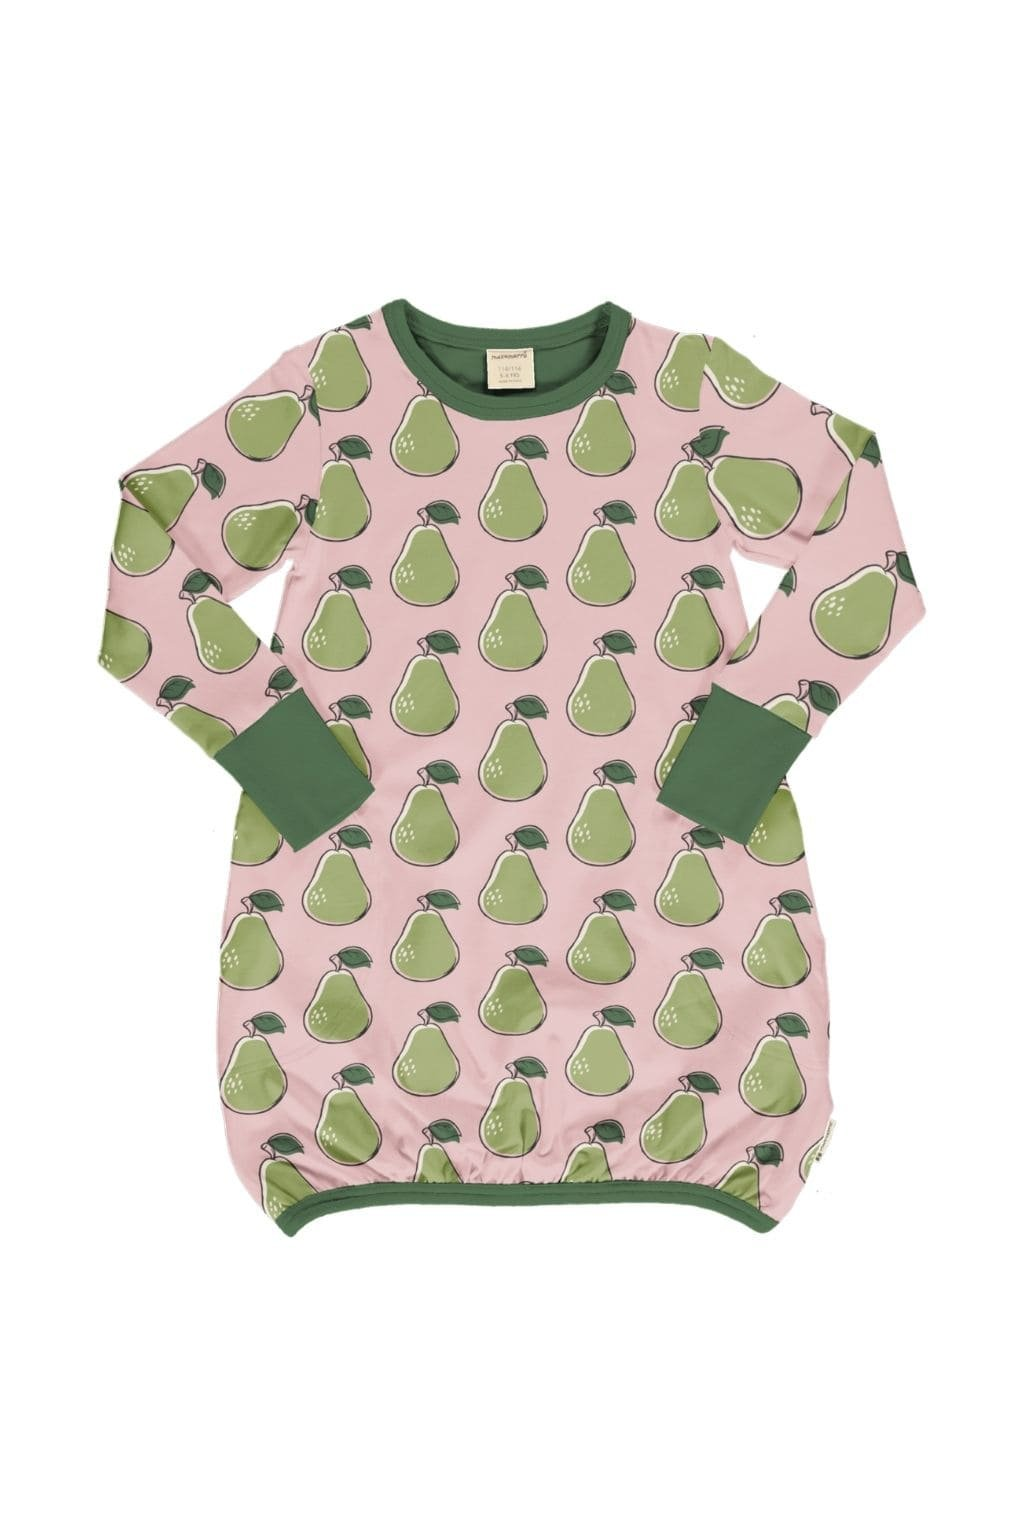 dress balloon ls pear (1)